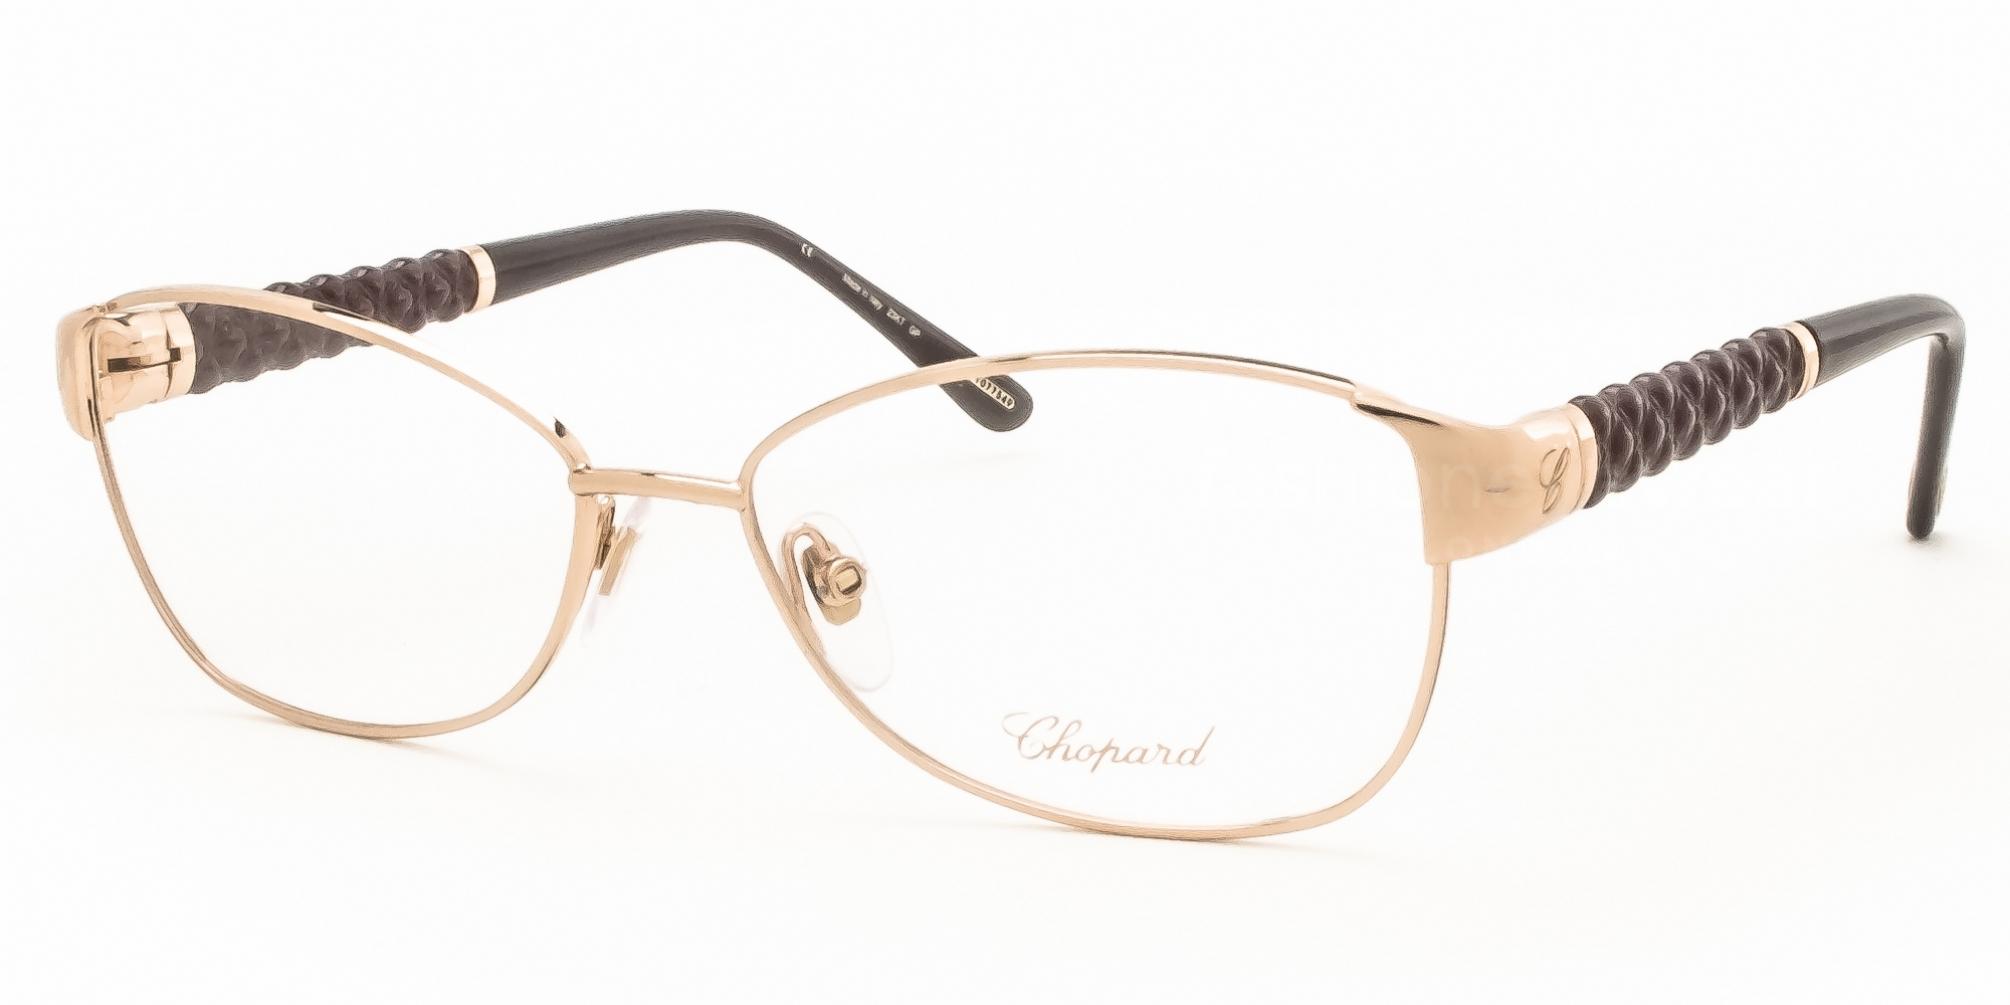 CHOPARD 964 08F